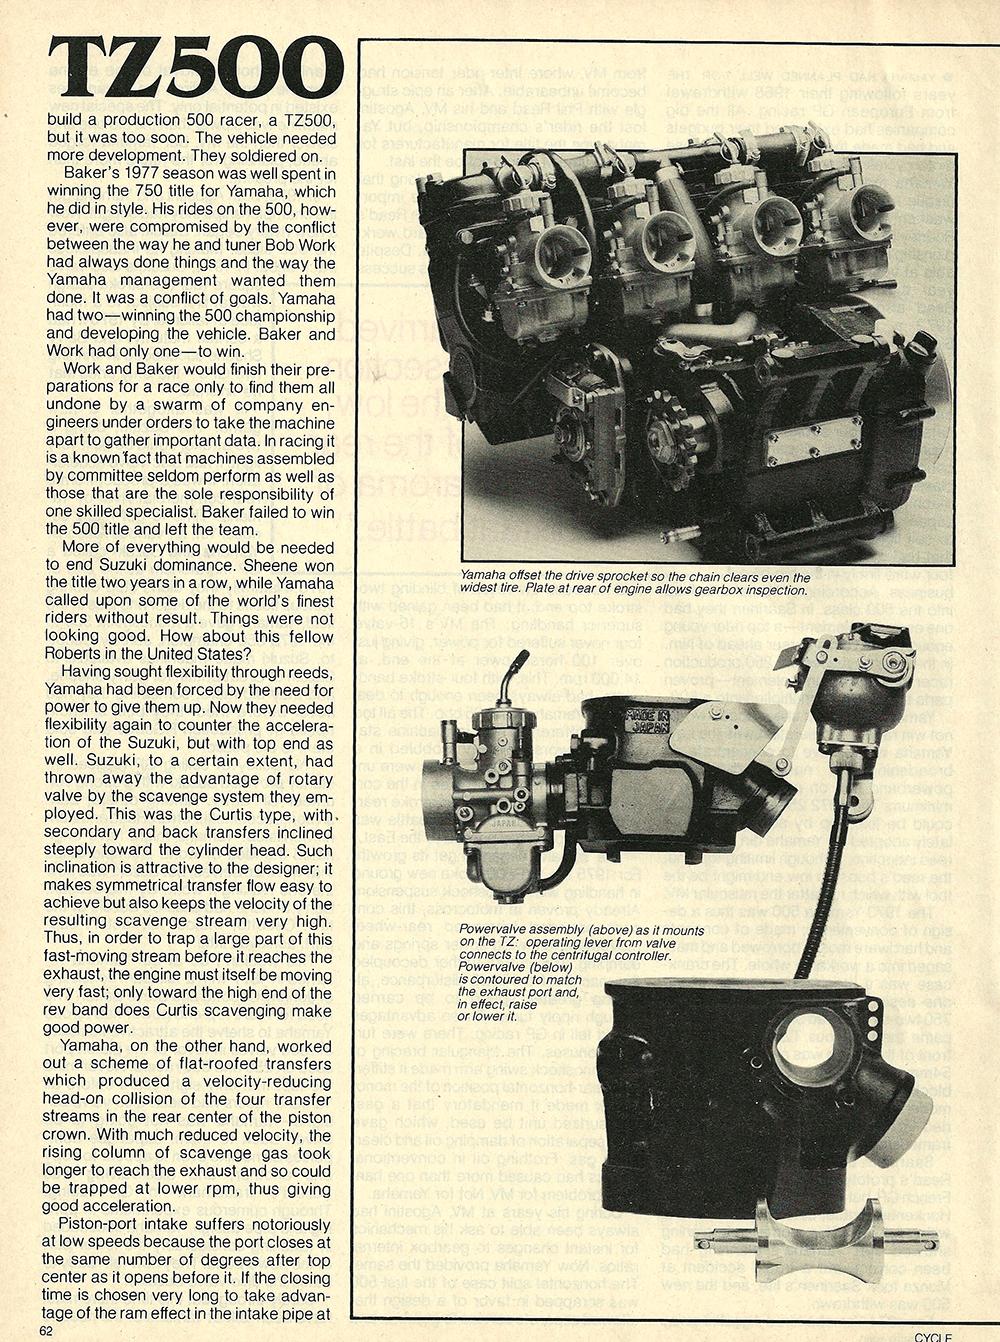 1980 Yamaha TZ500 test 03.jpg